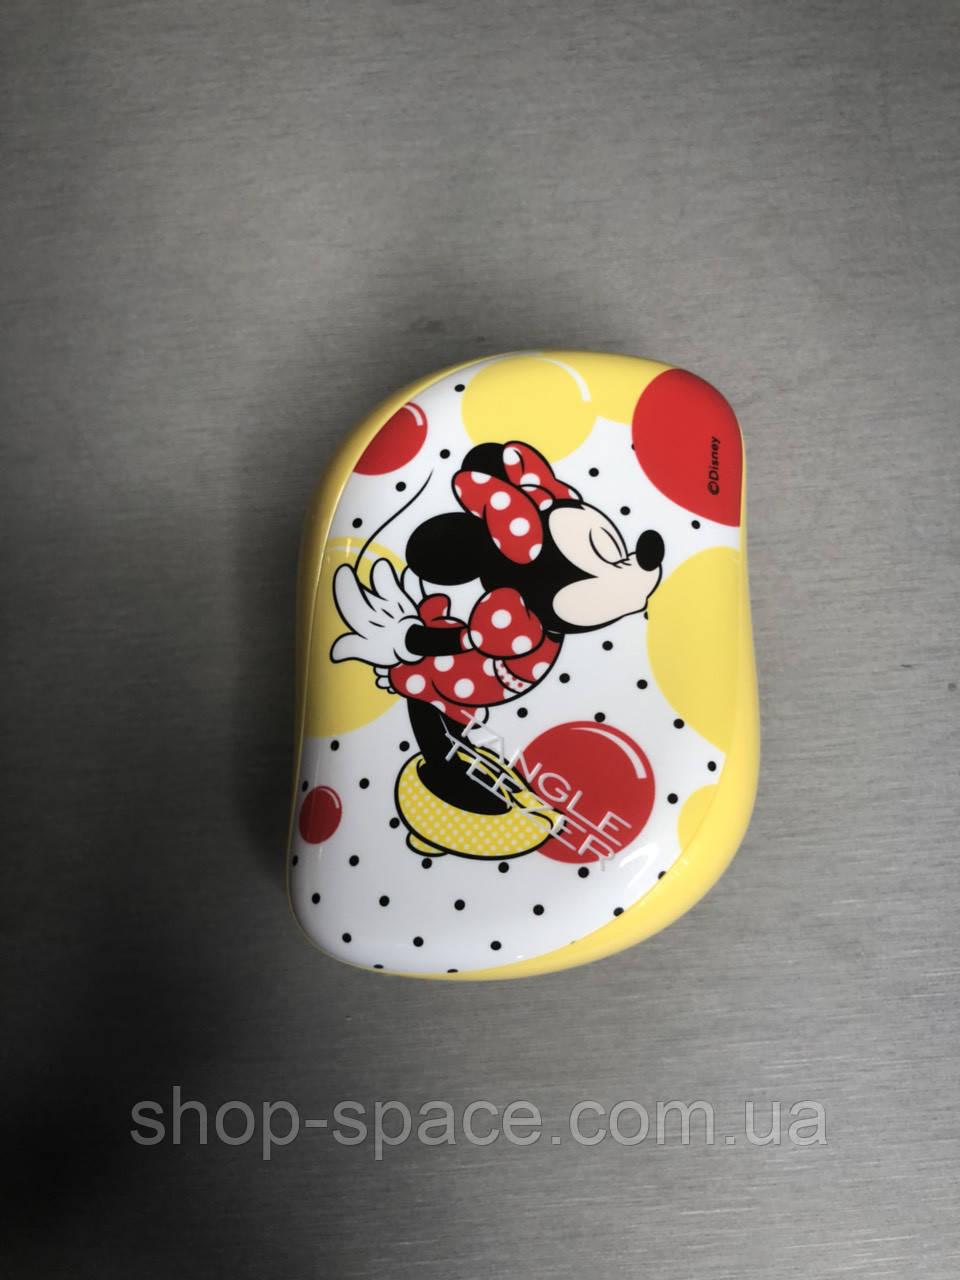 Расческа Tangle Teezer Minnie Mouse